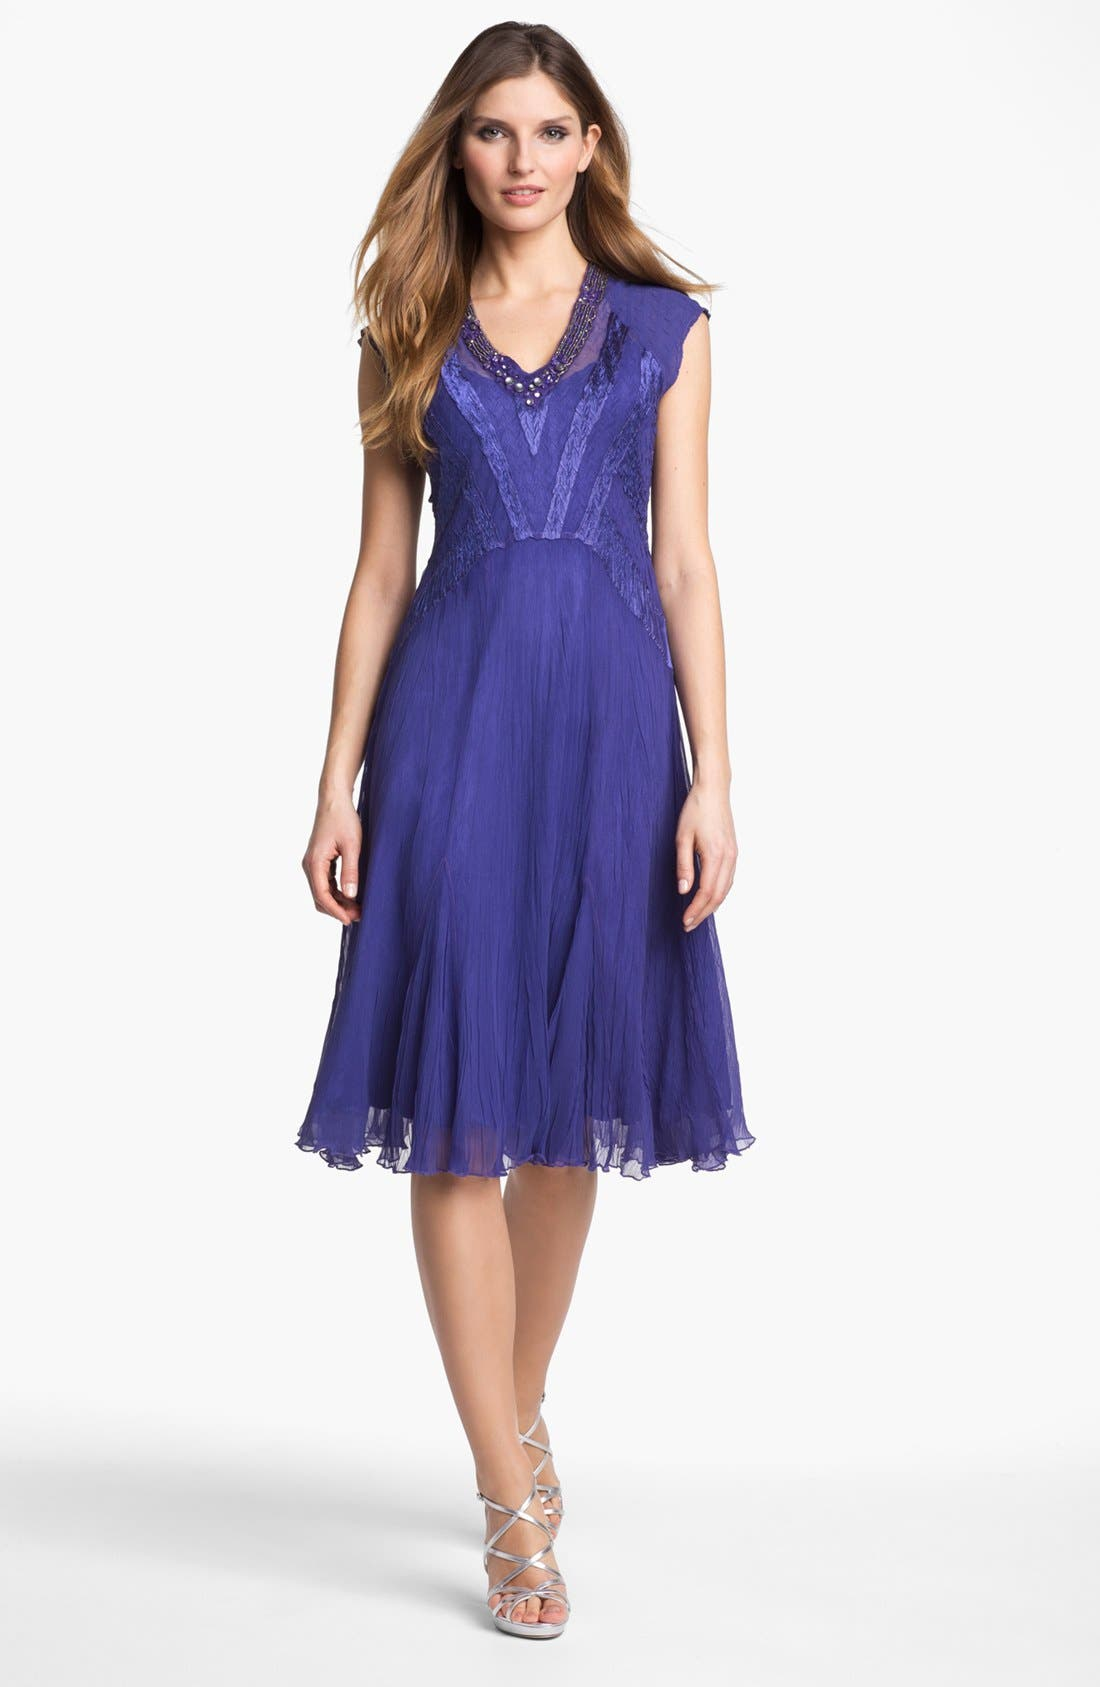 Main Image - Komarov Embellished Textured Chiffon Dress (Petite)